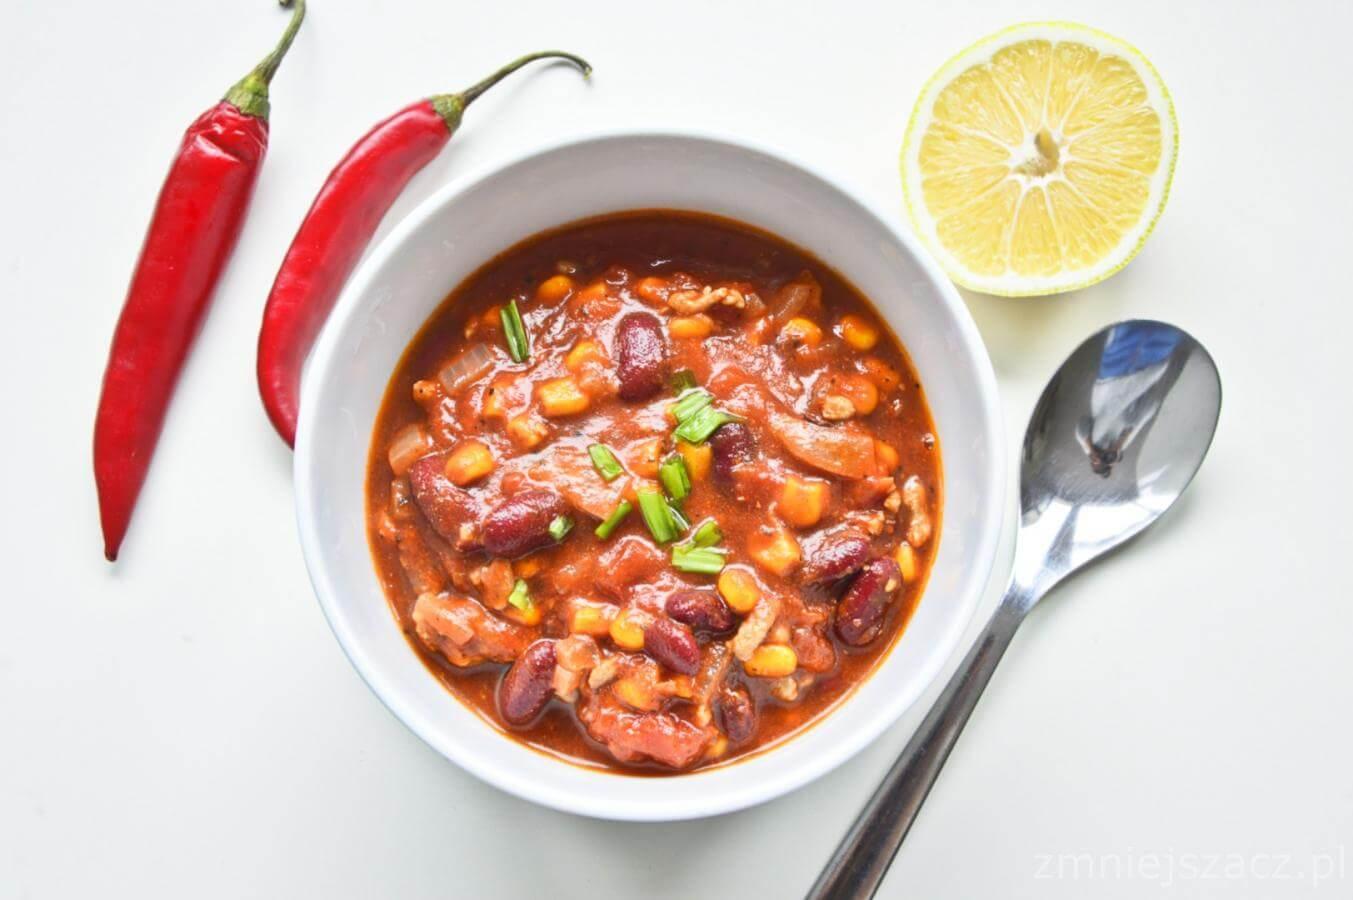 zupa-meksykanska-przepis